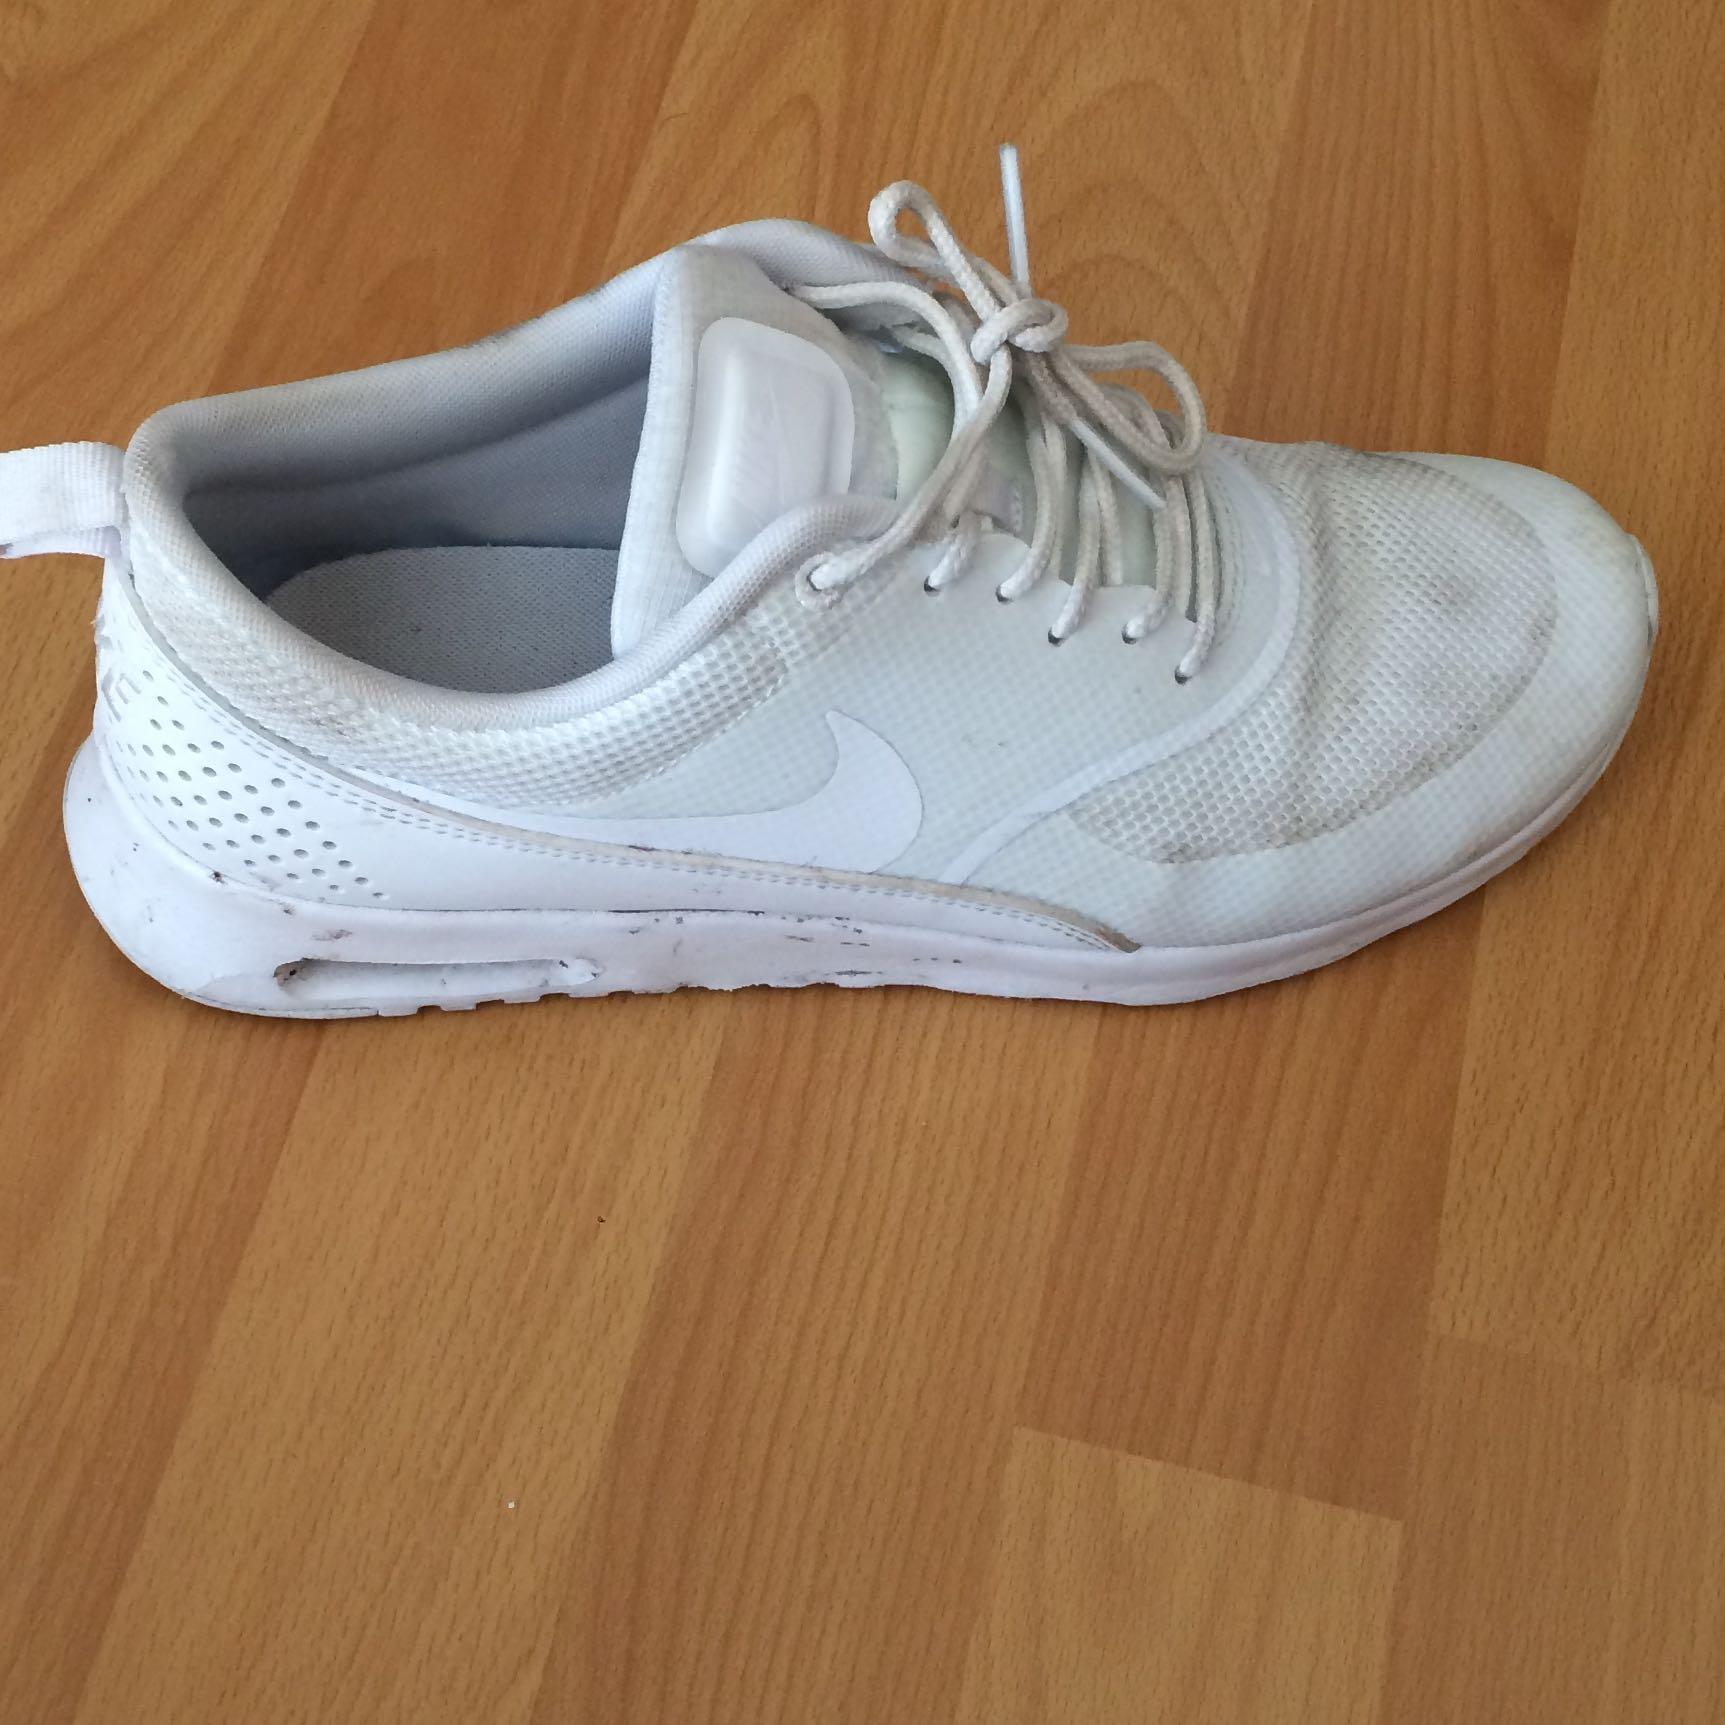 Max Air Aktion Cl1jfkt3 Thea Nike Schuhe Waschen 6Y7ybfgv